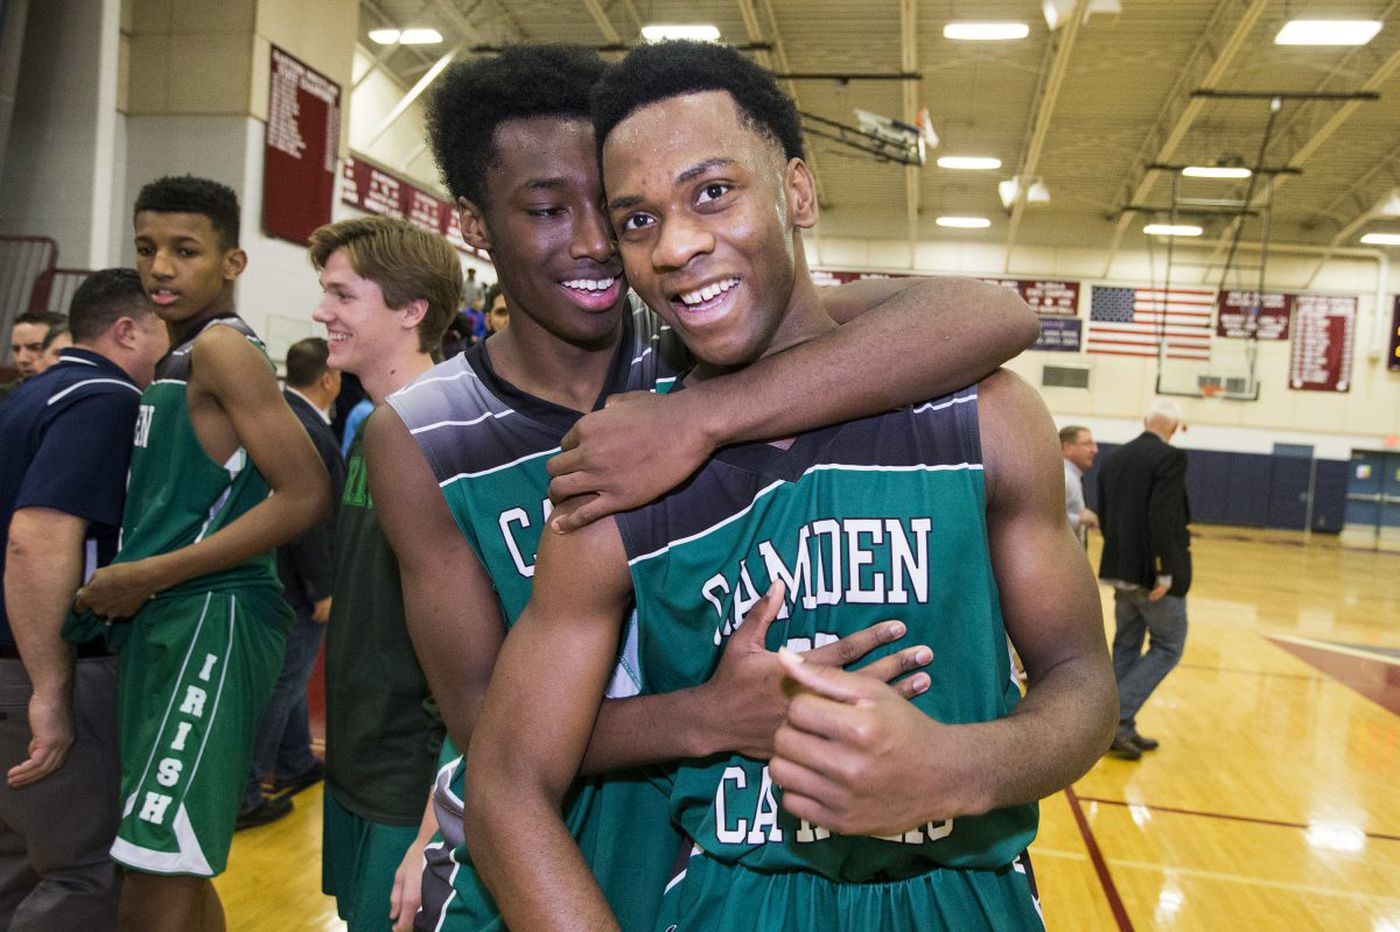 Camden Catholic's Pat Corbett leads Irish boys' basketball team past Eastern